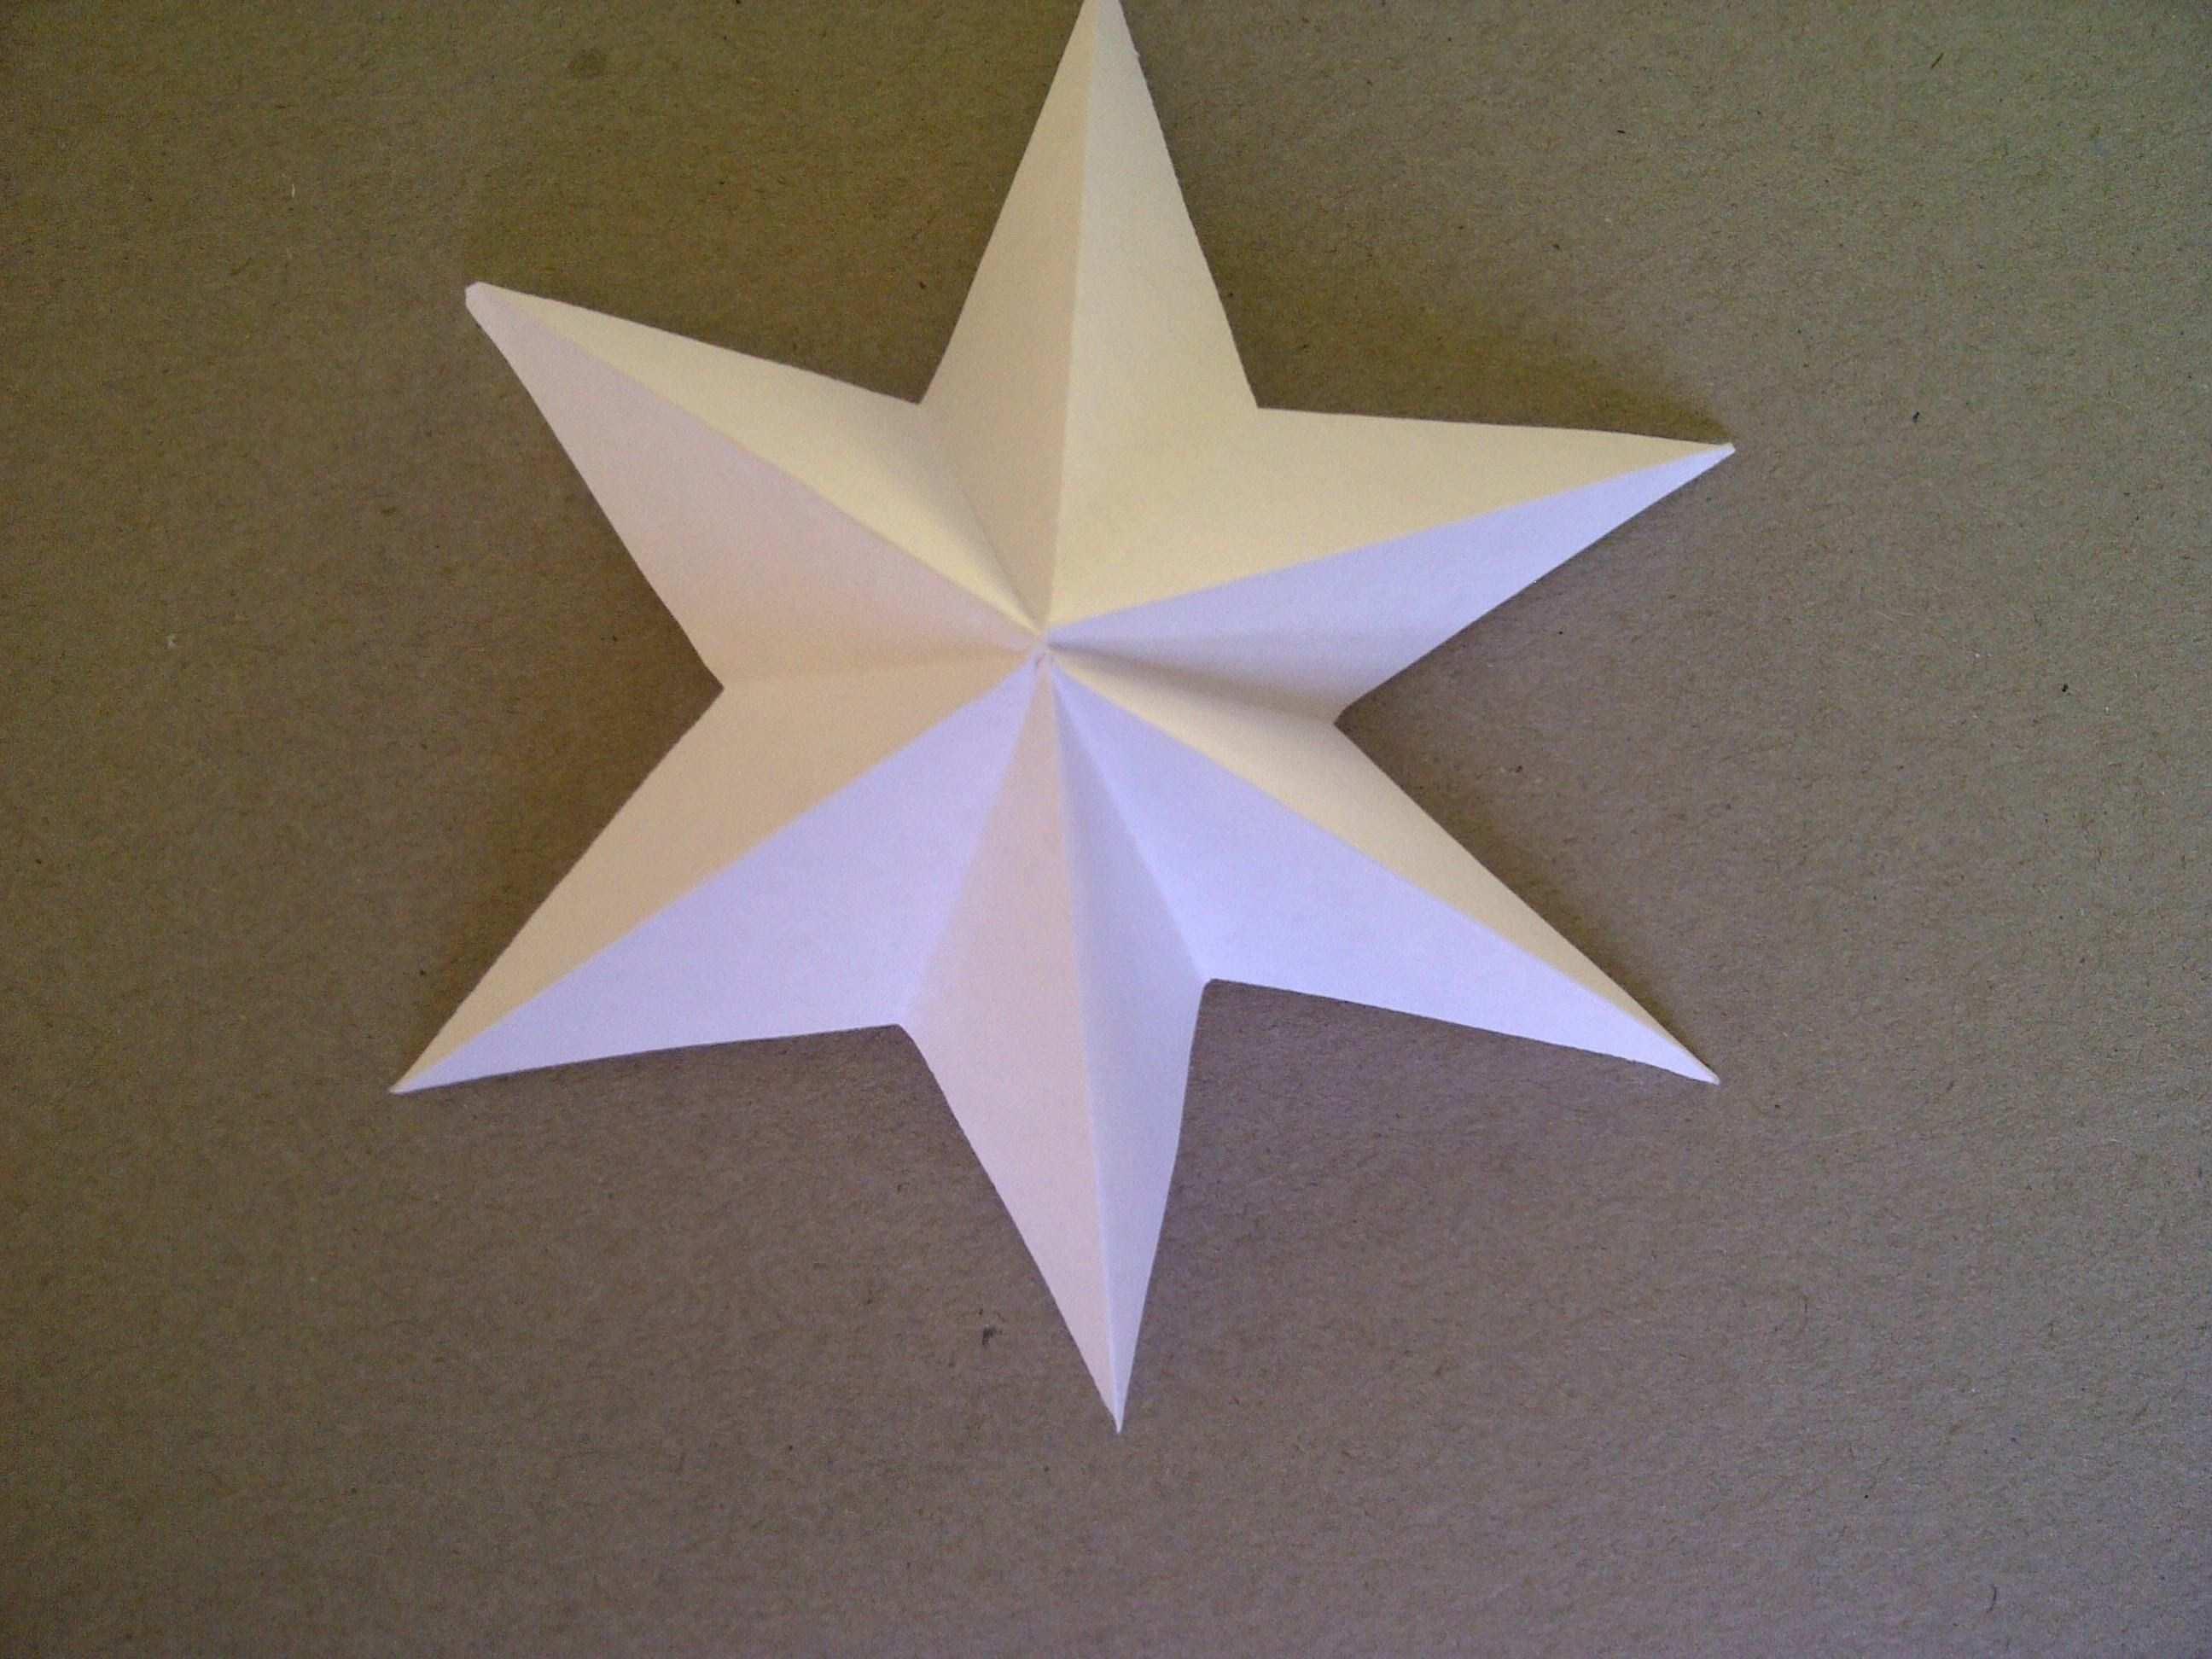 3d Sterne Basteln 6 Zackiger Stern Aus Papier Falten Sehr Einfach 3d Sterne Basteln Sterne Falten Weihnachten Sterne Basteln Aus Papier